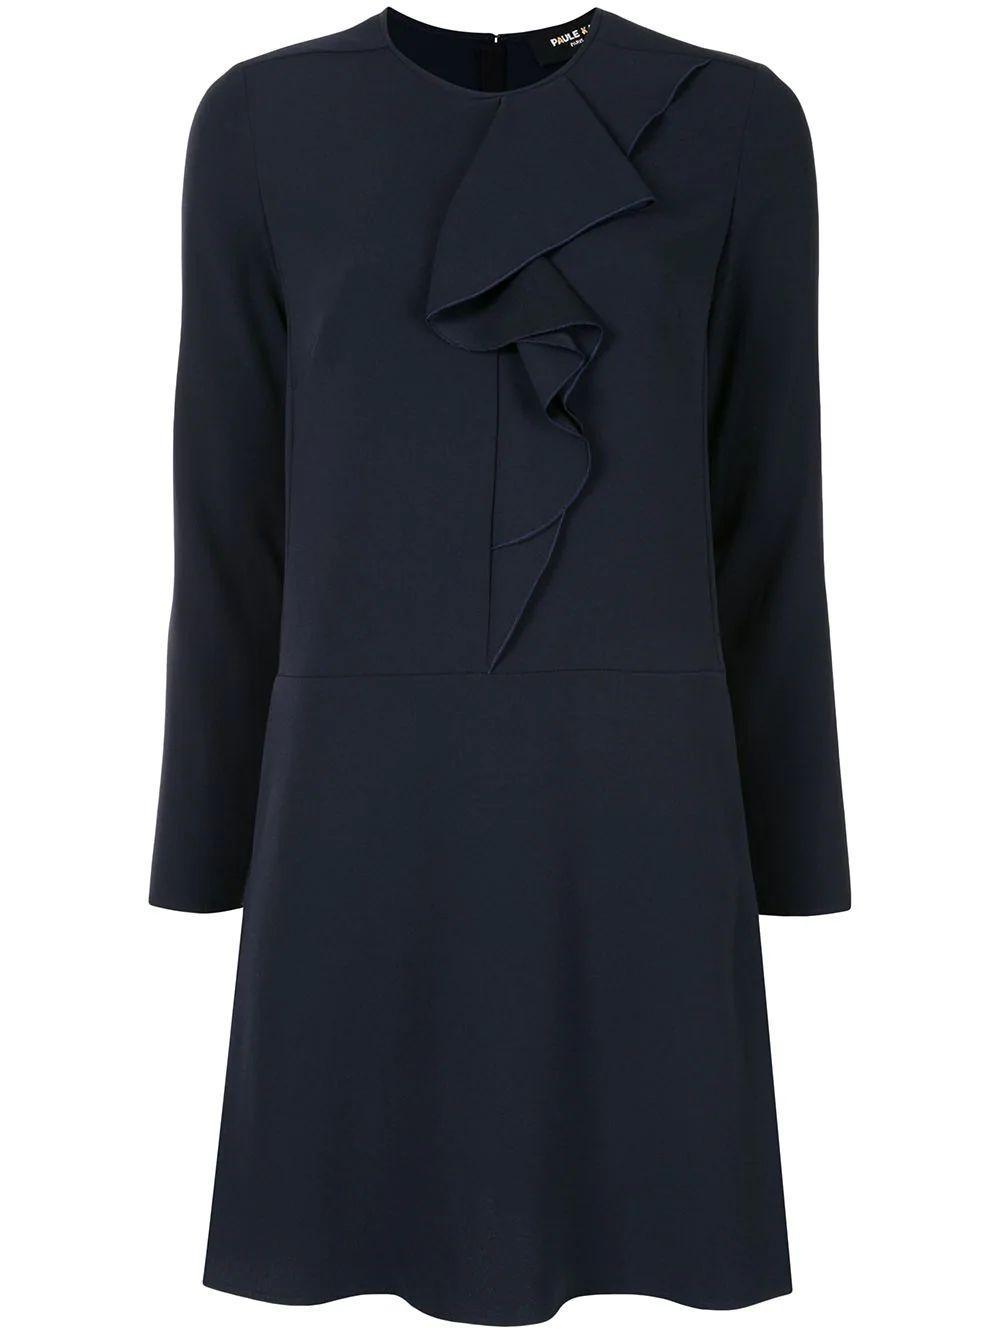 Ruffle Front Dress Item # 180/R100